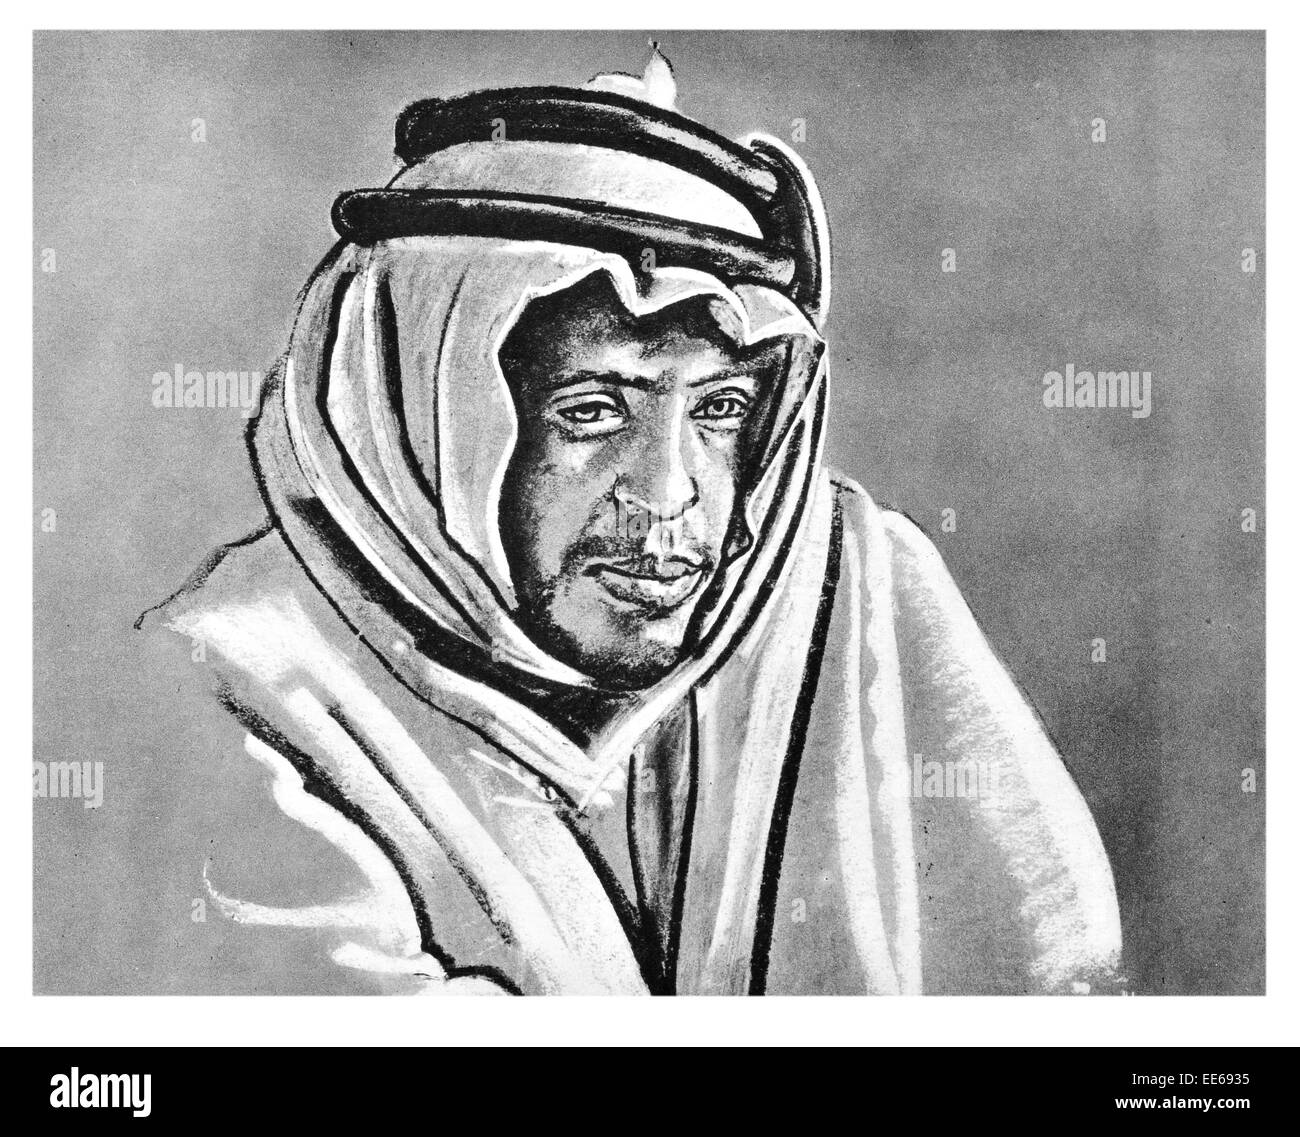 Abdulaziz Ibn Abdul Rahman Faisal Turki Abdullah Muhammad Saud Monarch Saudi Arabia King Prince